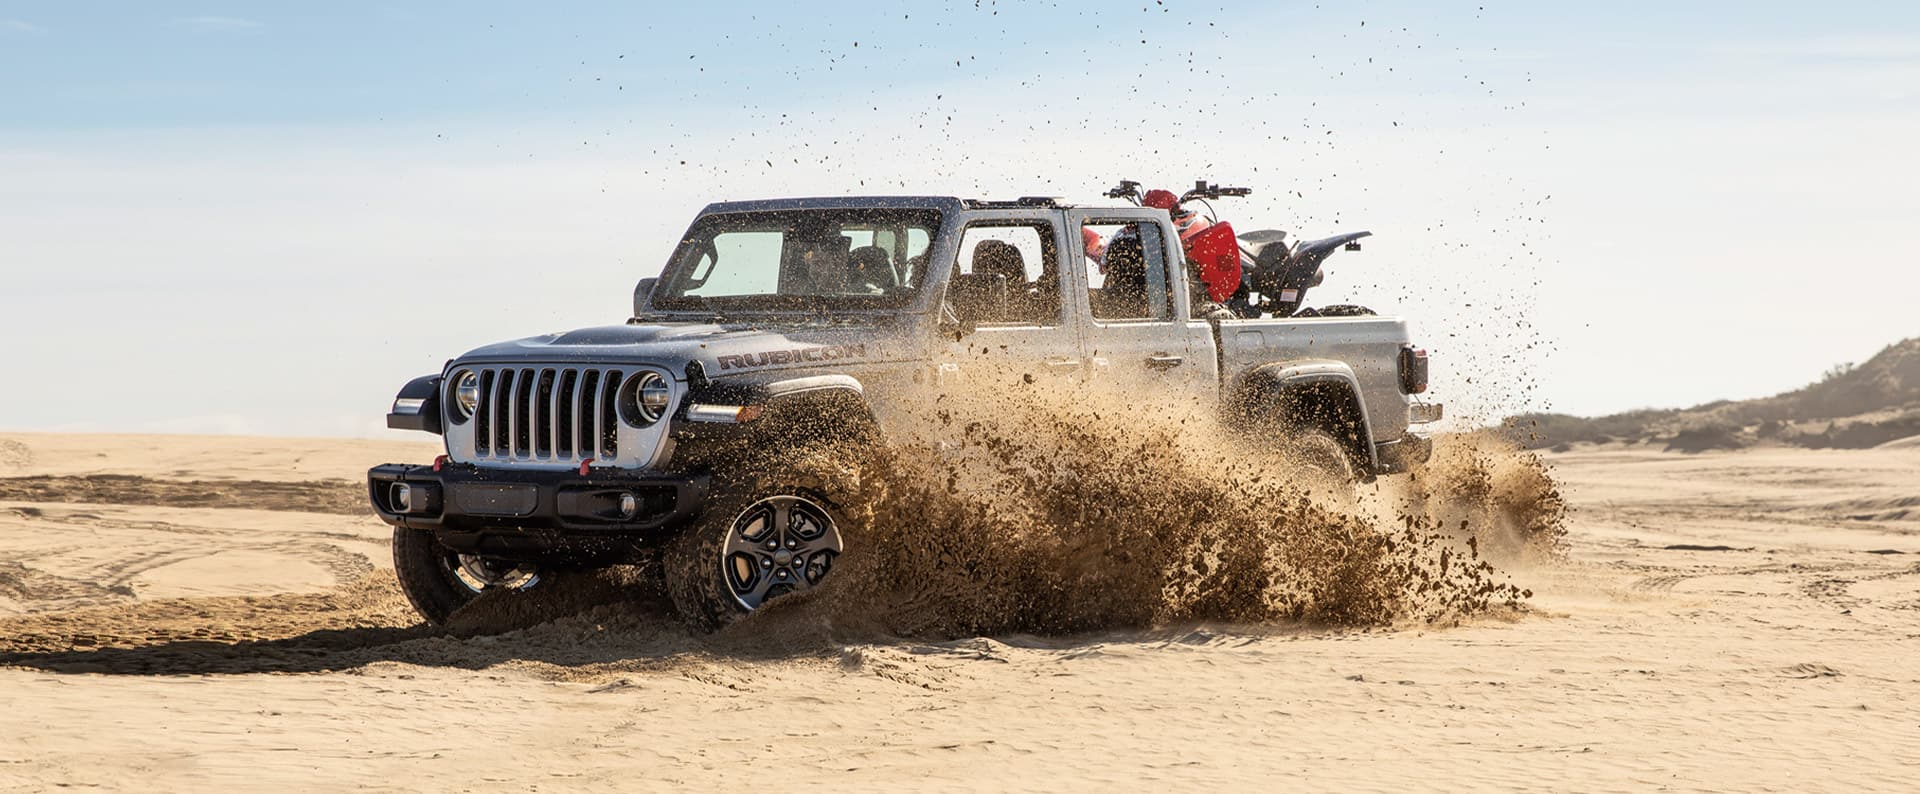 2021 Jeep Gladiator Capability 4x4 Truck Performance